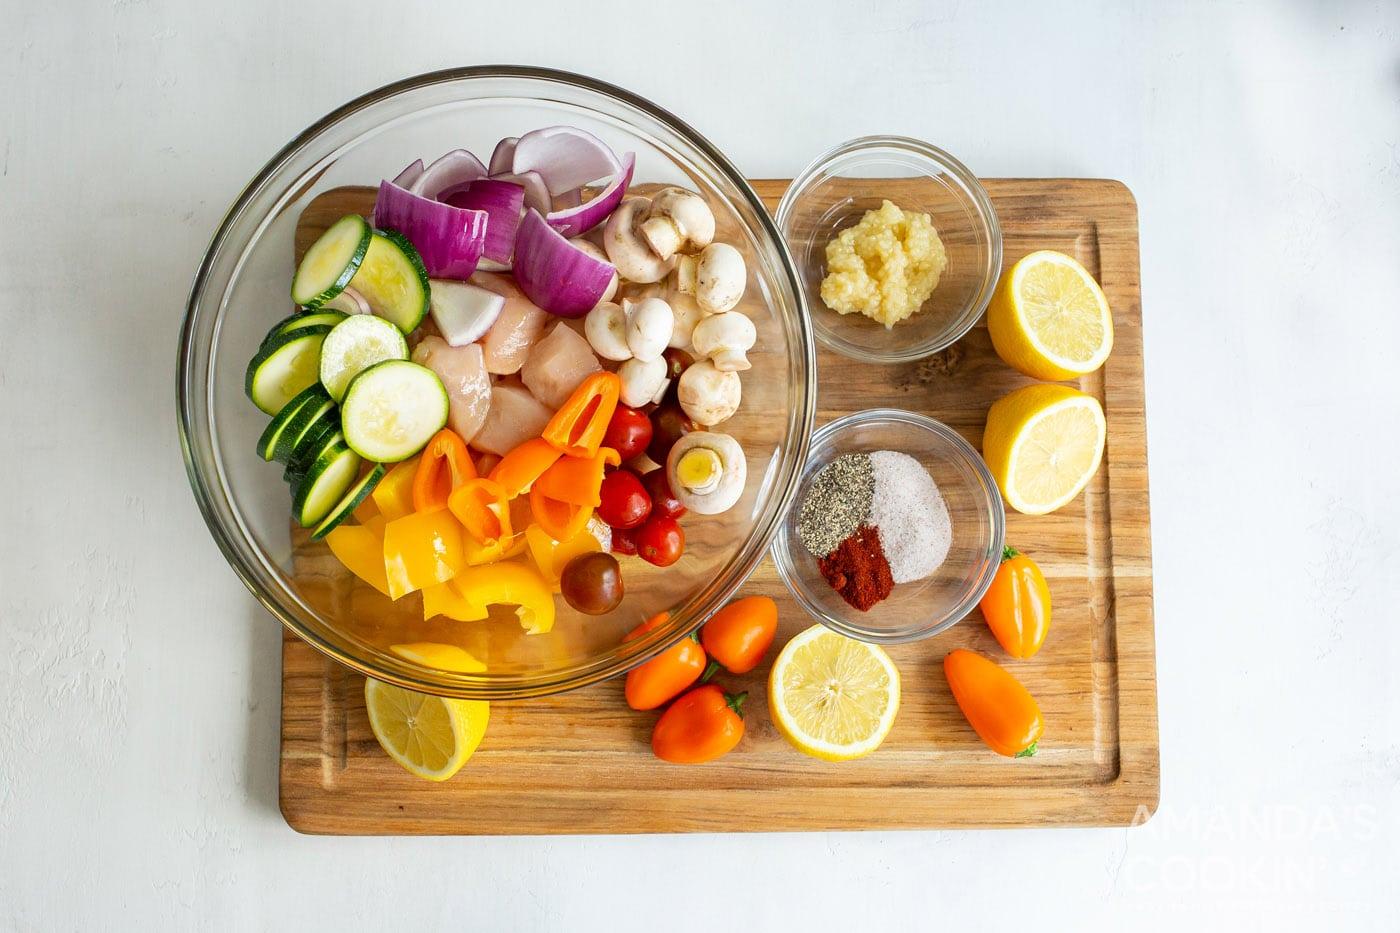 sliced veggies in a bowl